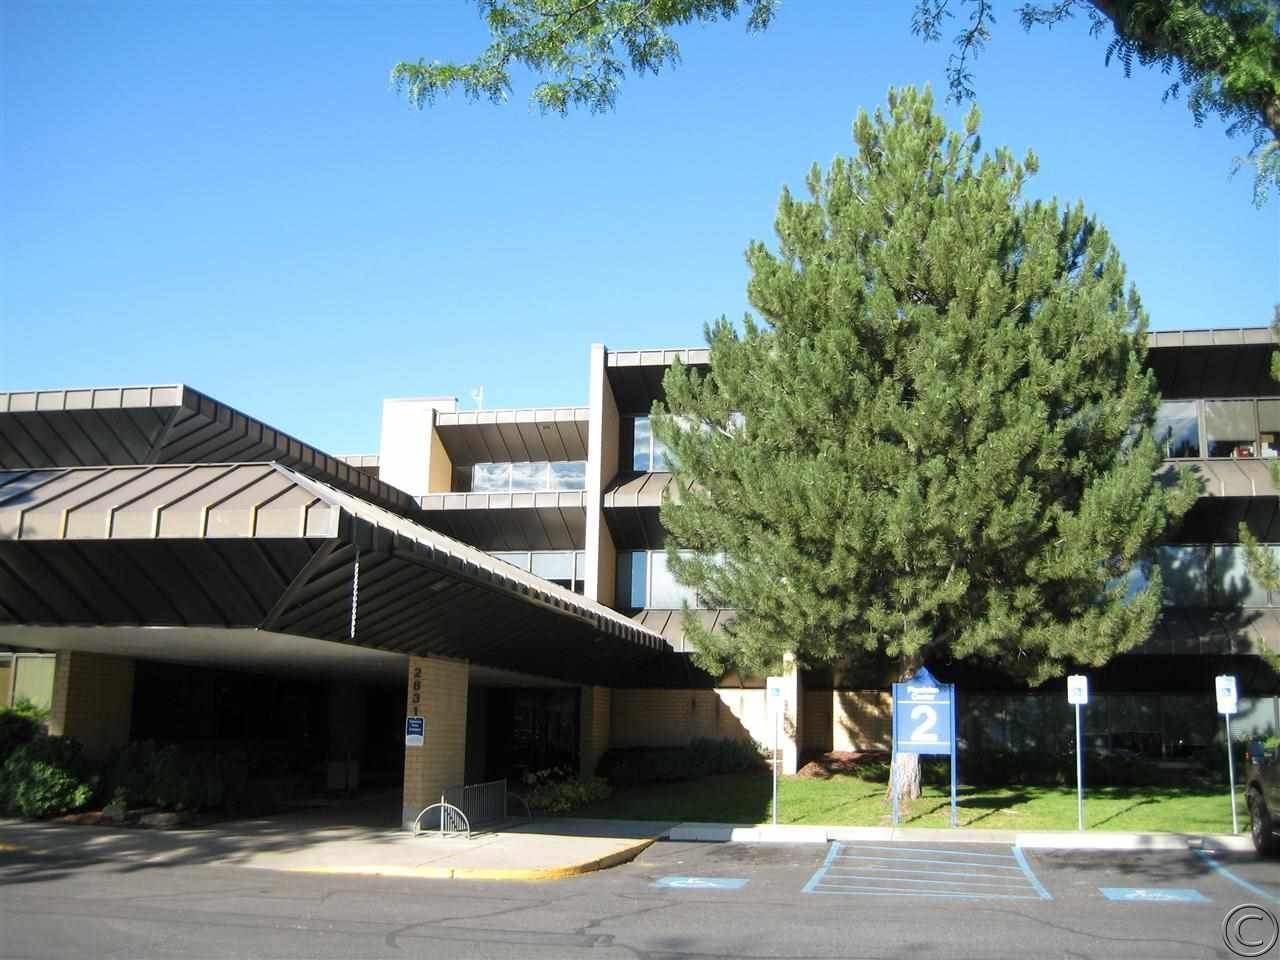 2831 Fort Missoula Road Suite 304, Missoula, MT 59804